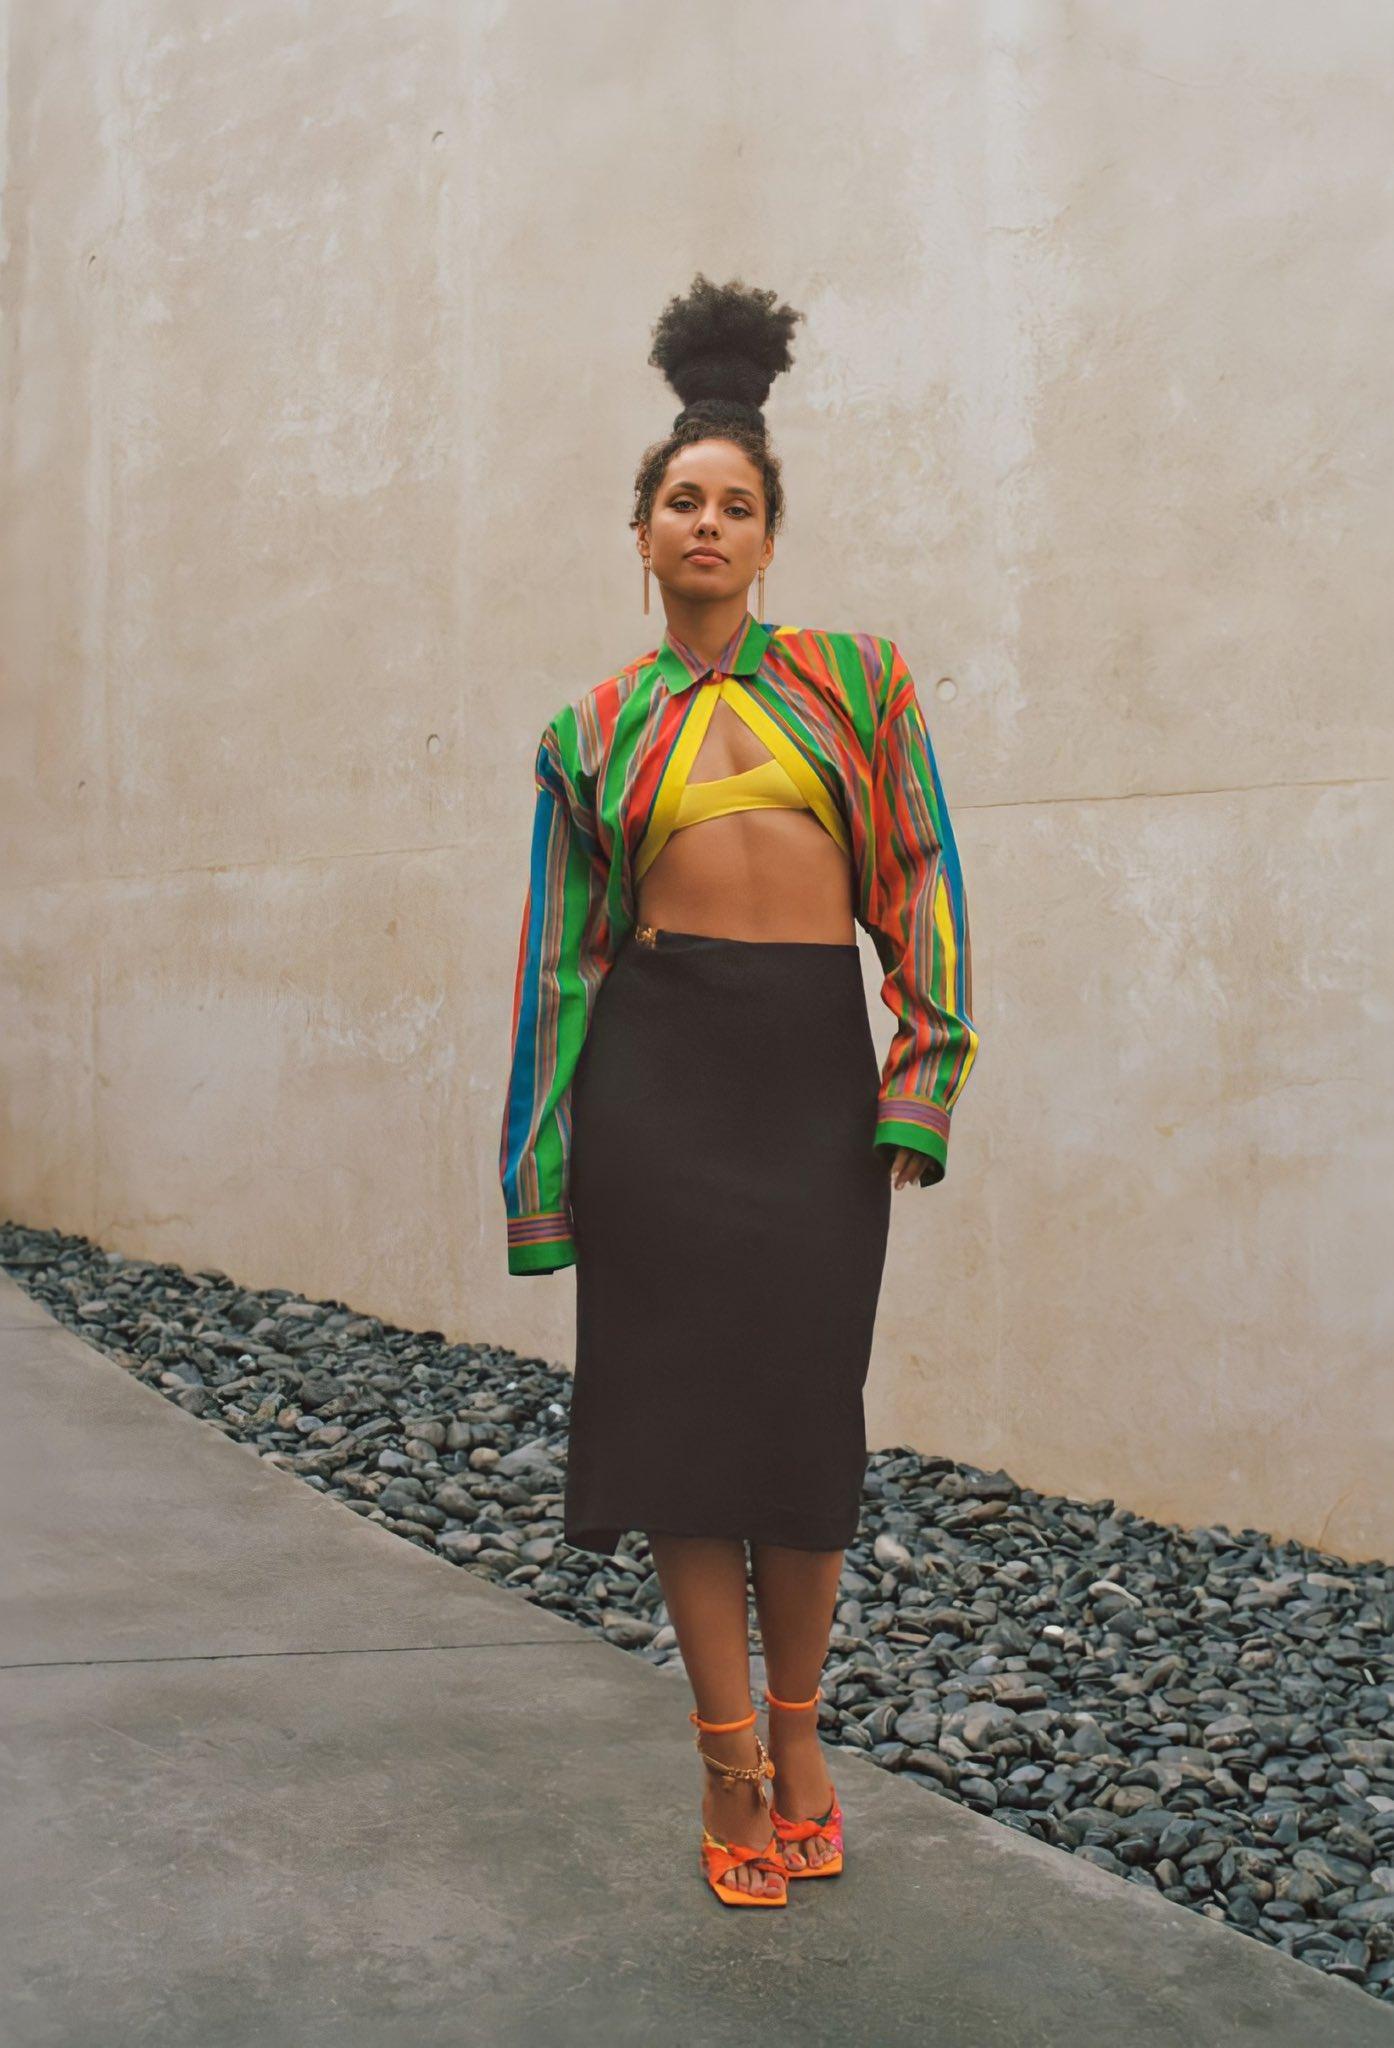 Alicia Keys Allure 2021 5 - Фото: Алиша Киз на обложке Allure